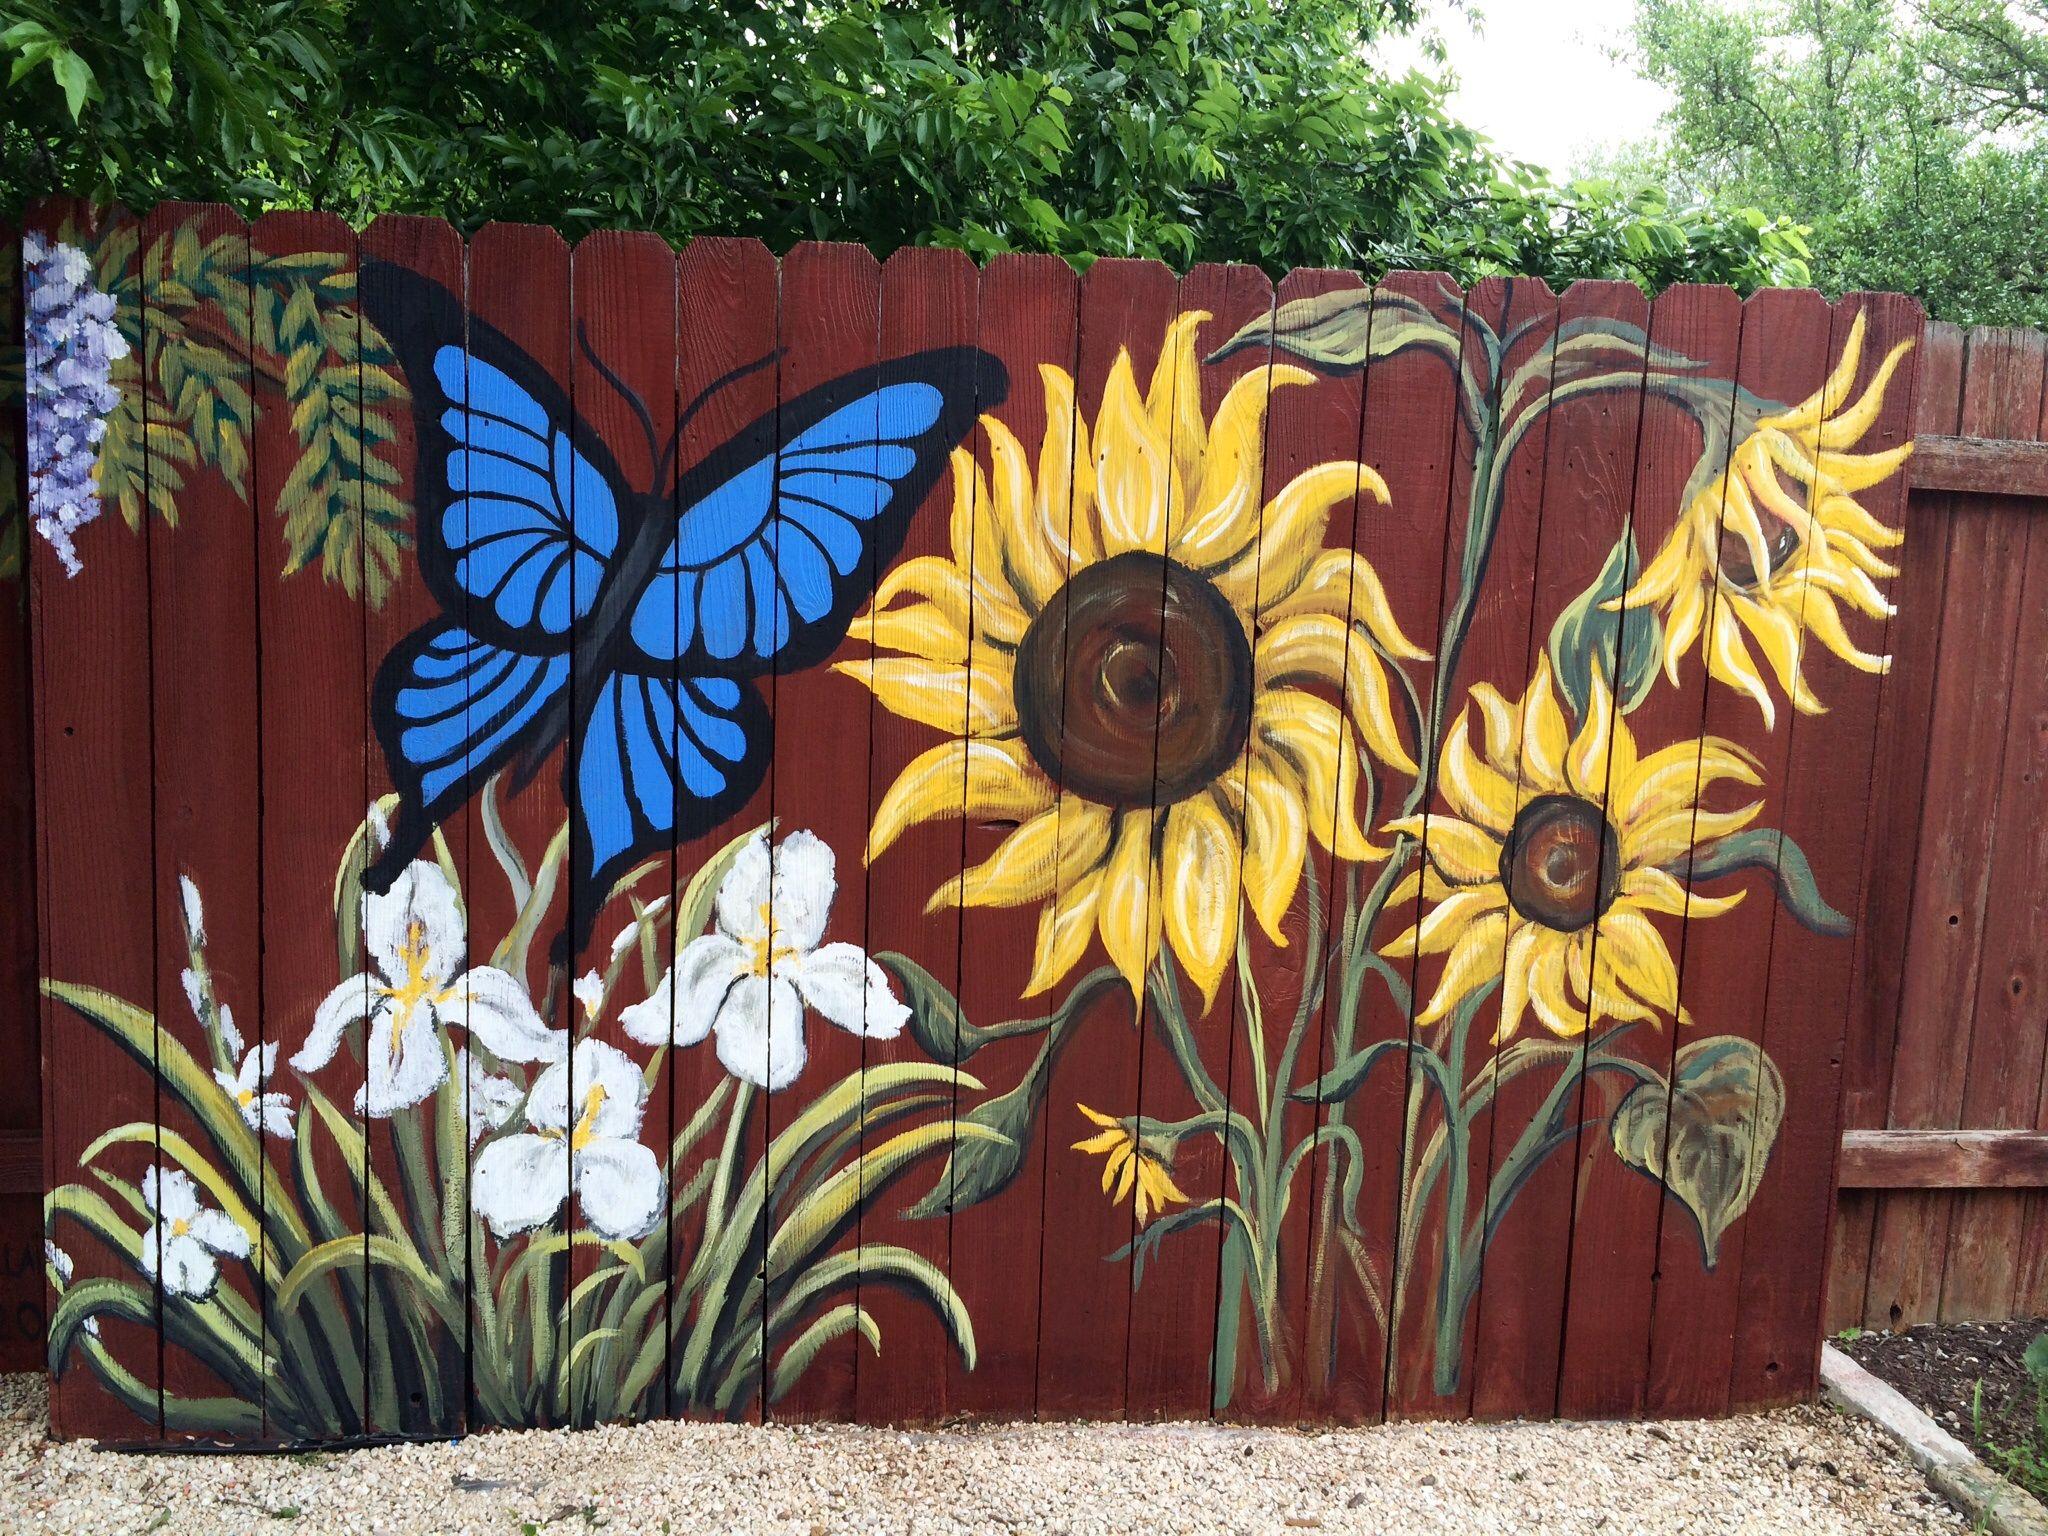 Garten Landschaftsbau · Part Of Three Panel Painted Fence That I Painted .  Www.facebook.com/